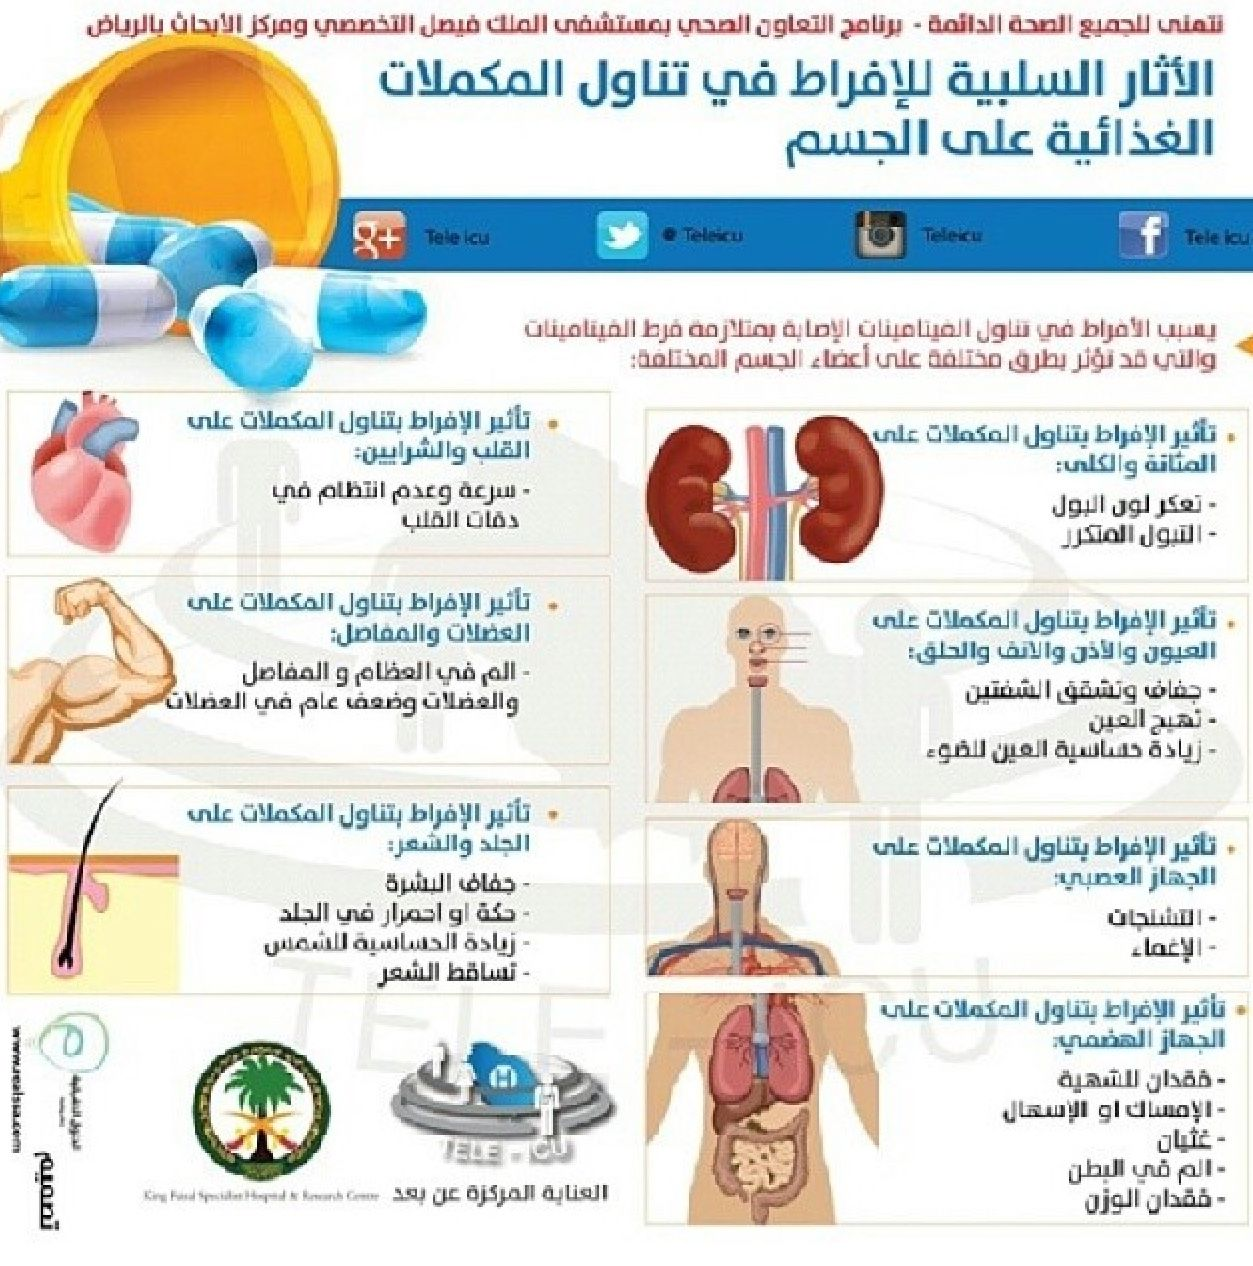 Pin By Jamal Dredi On Health Awareness توعية صحية Health Topics Shopping